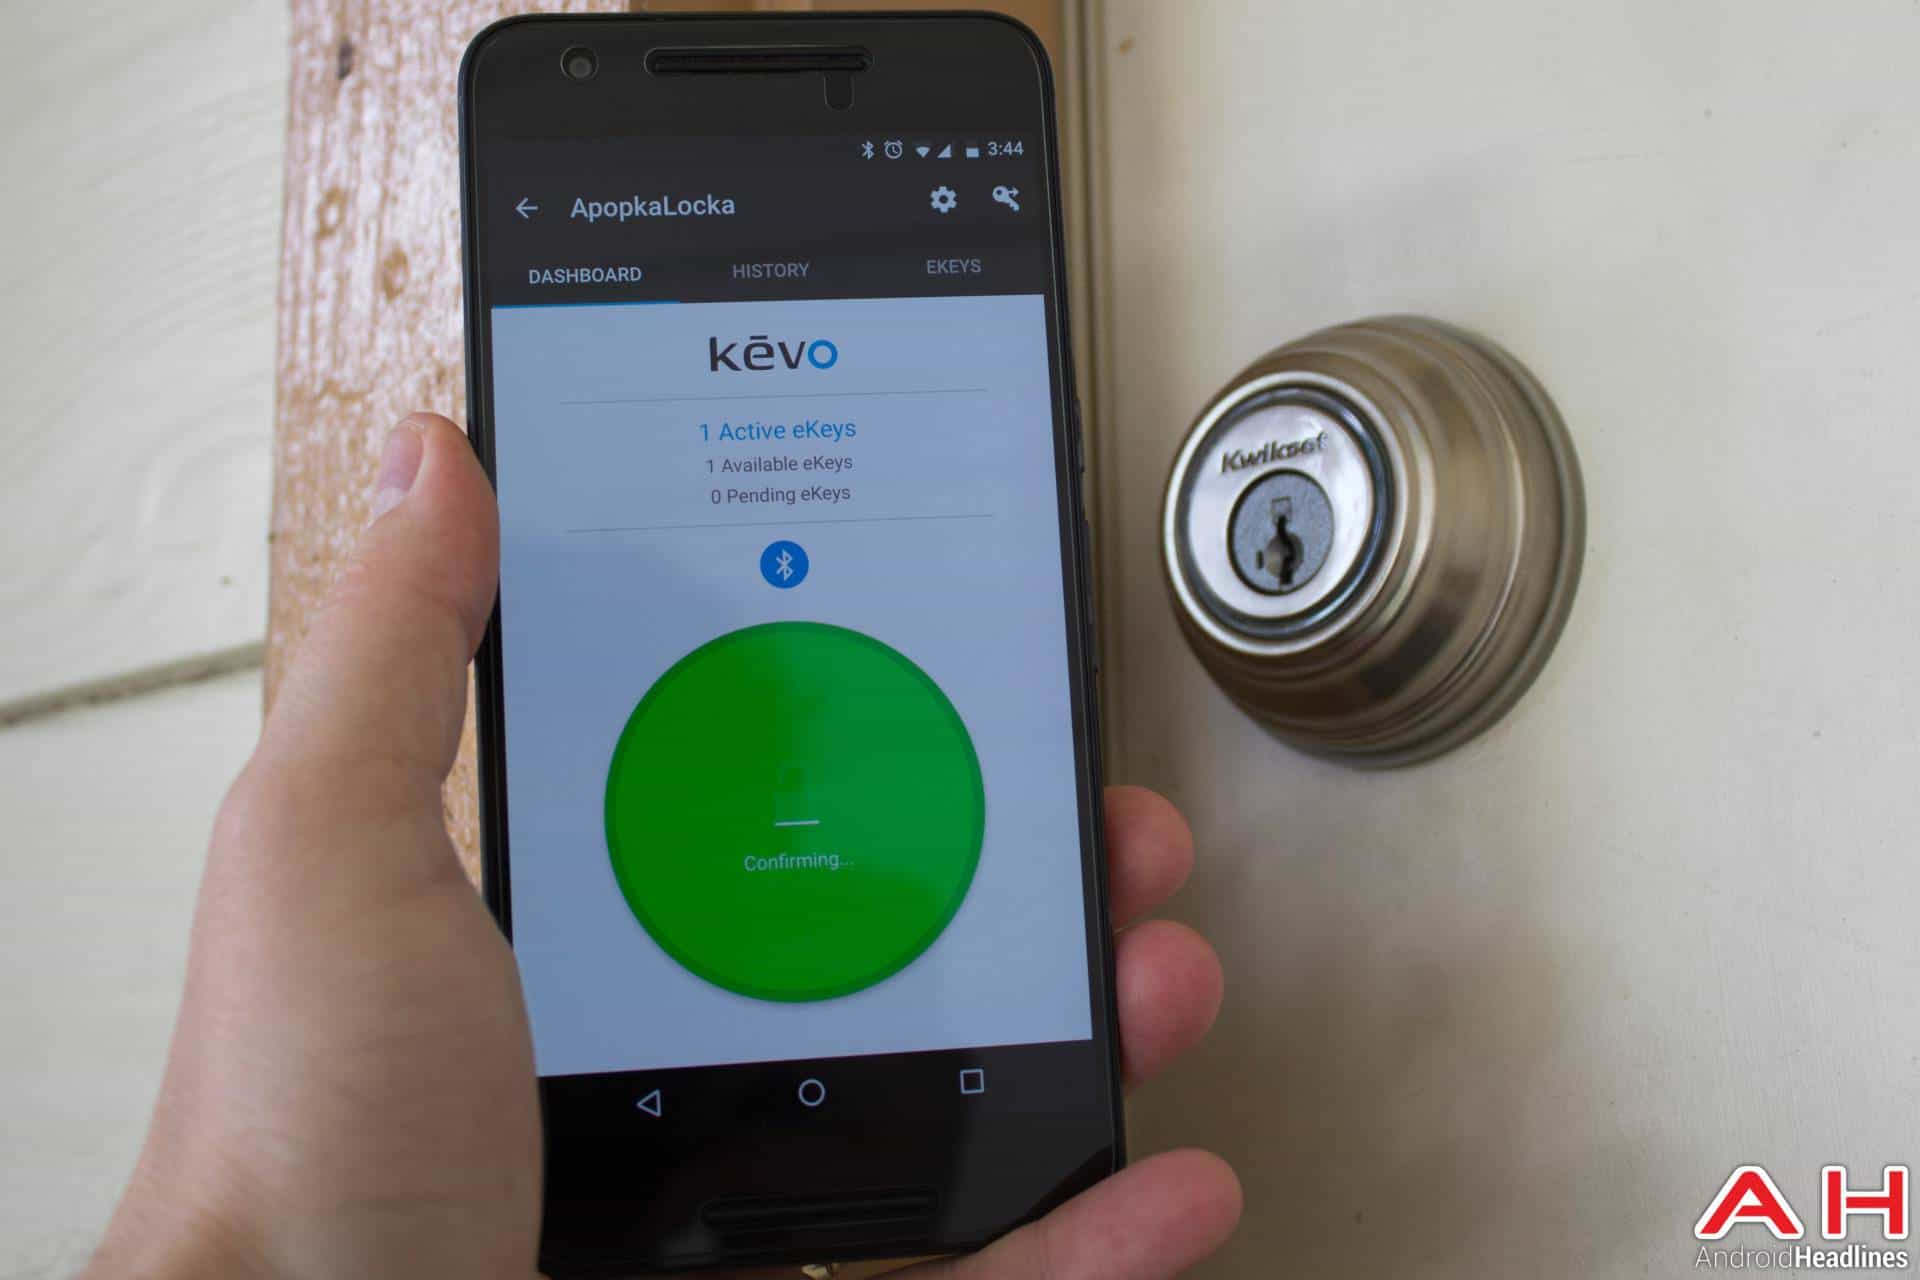 Review: Kwikset Kevo Bluetooth Deadbolt | Androidheadlines.com